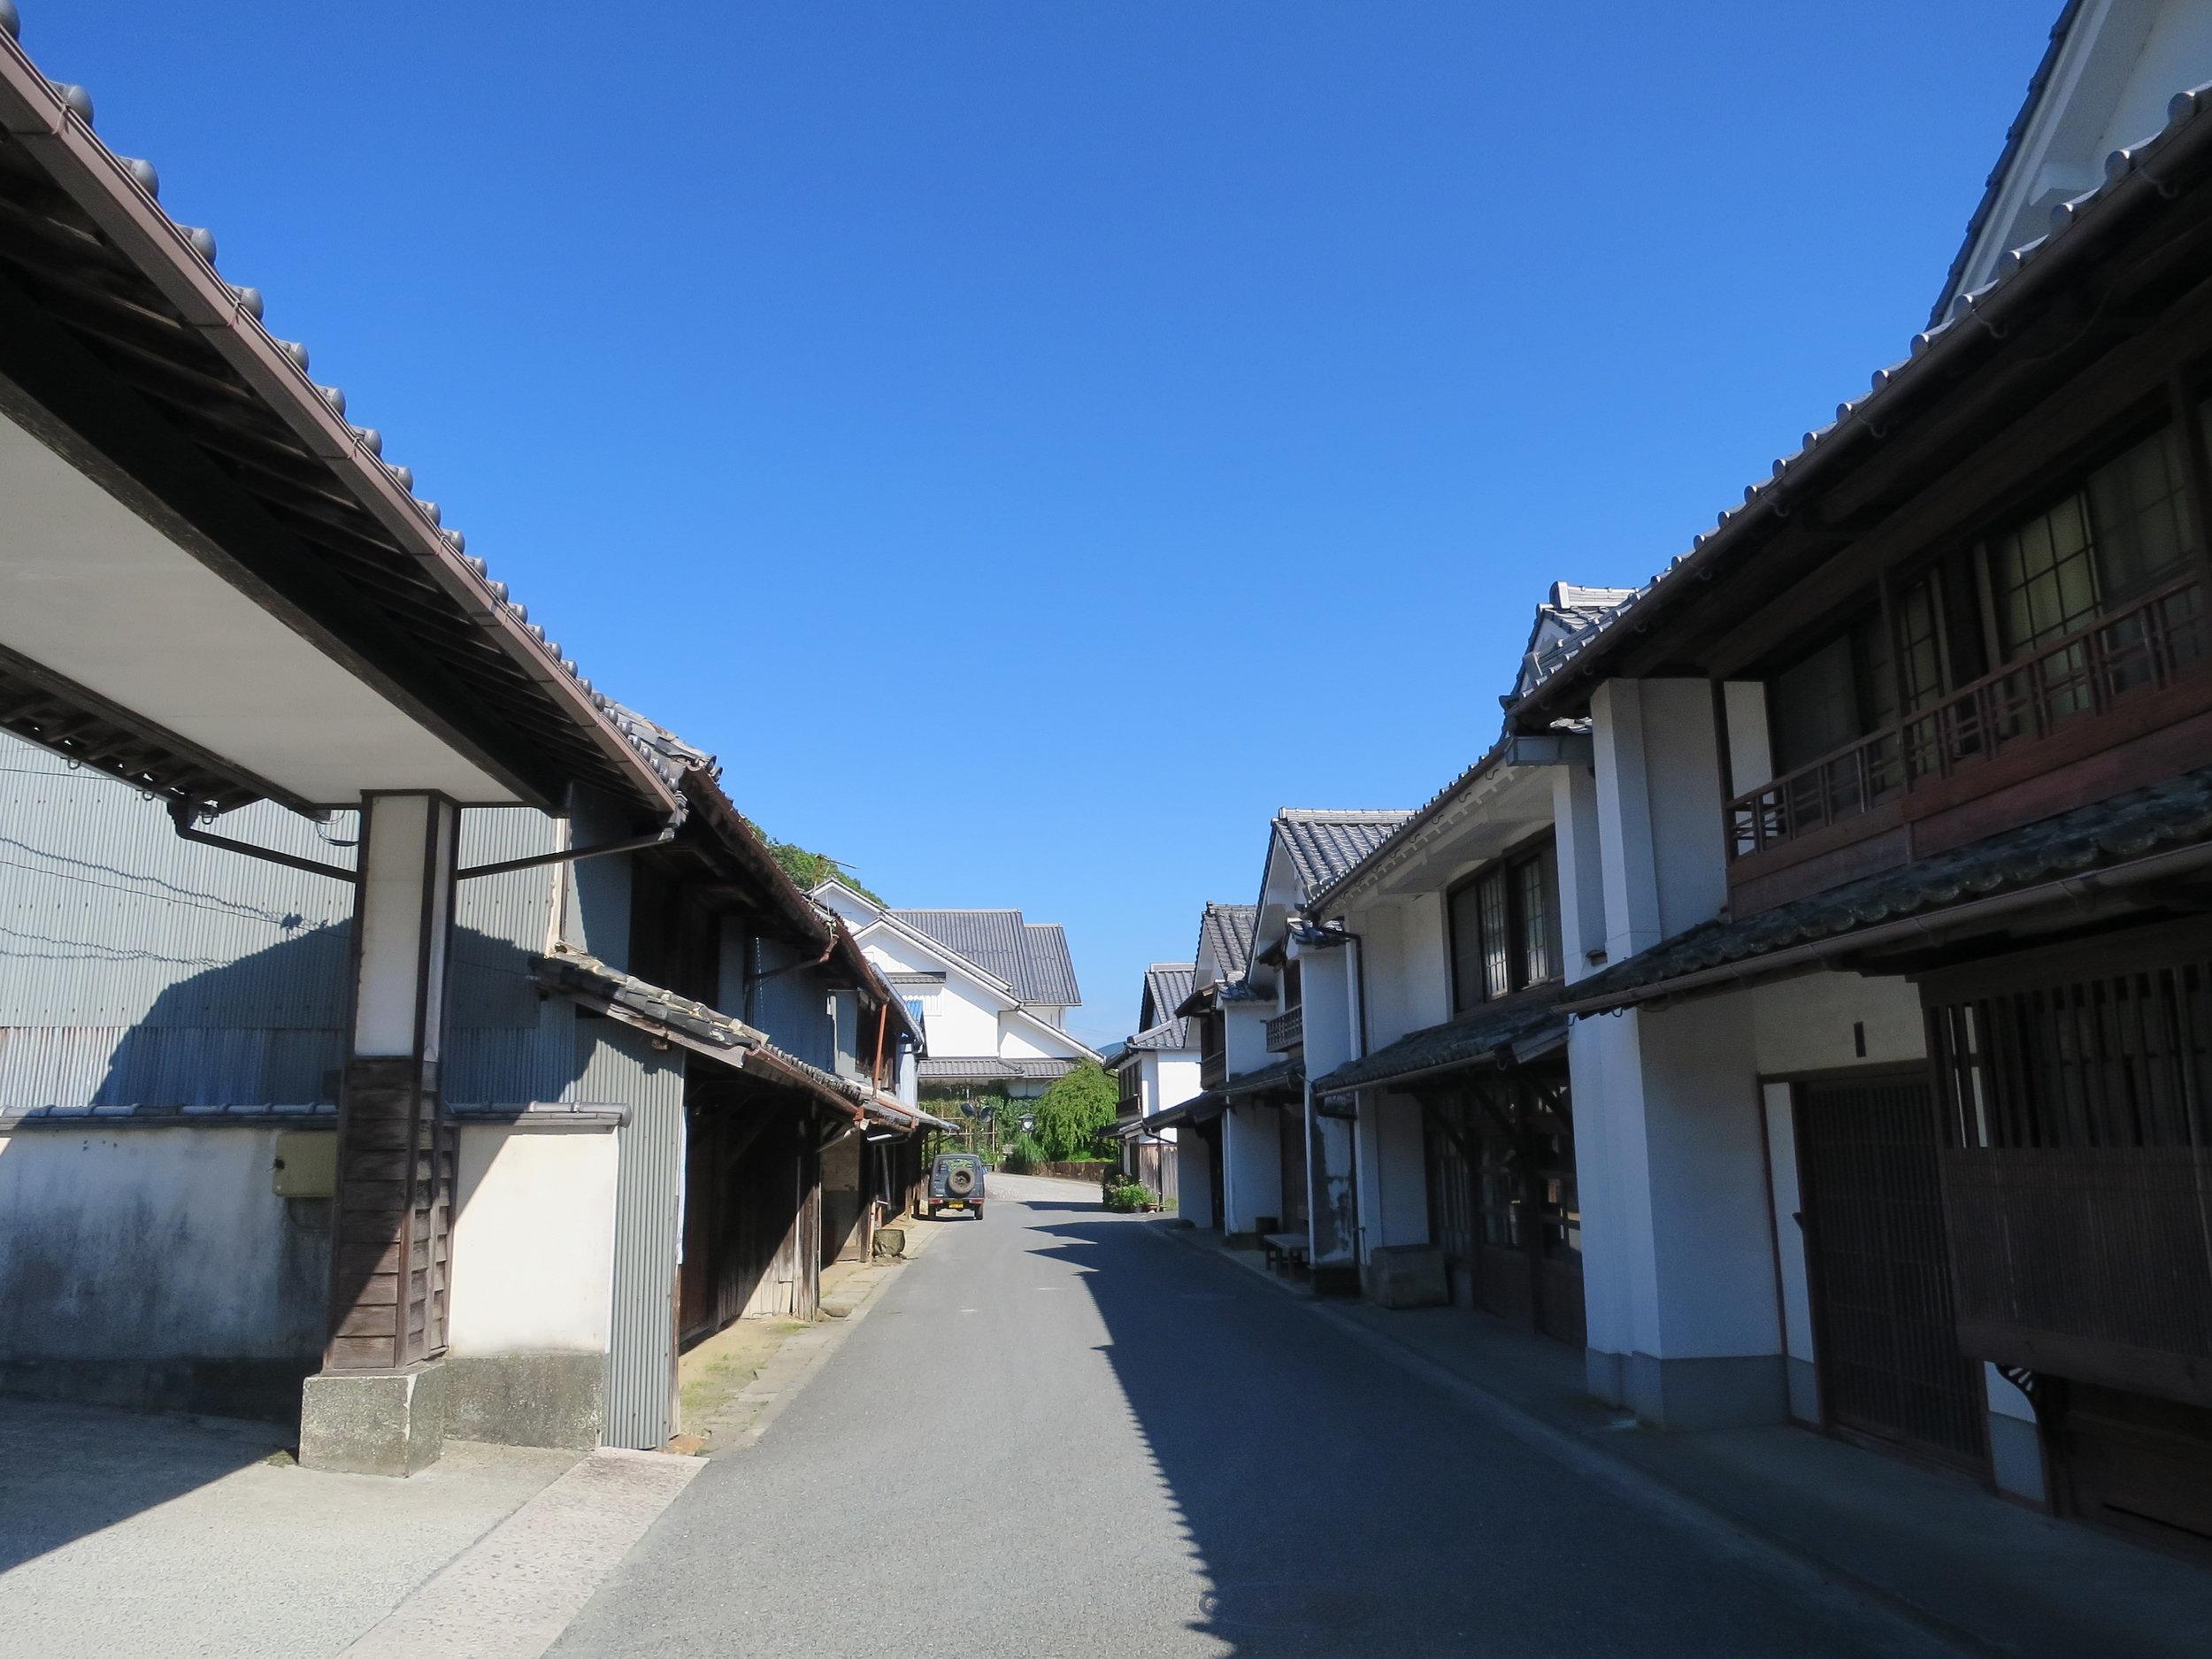 Old buildings from the Edo Period in Uwa-machi